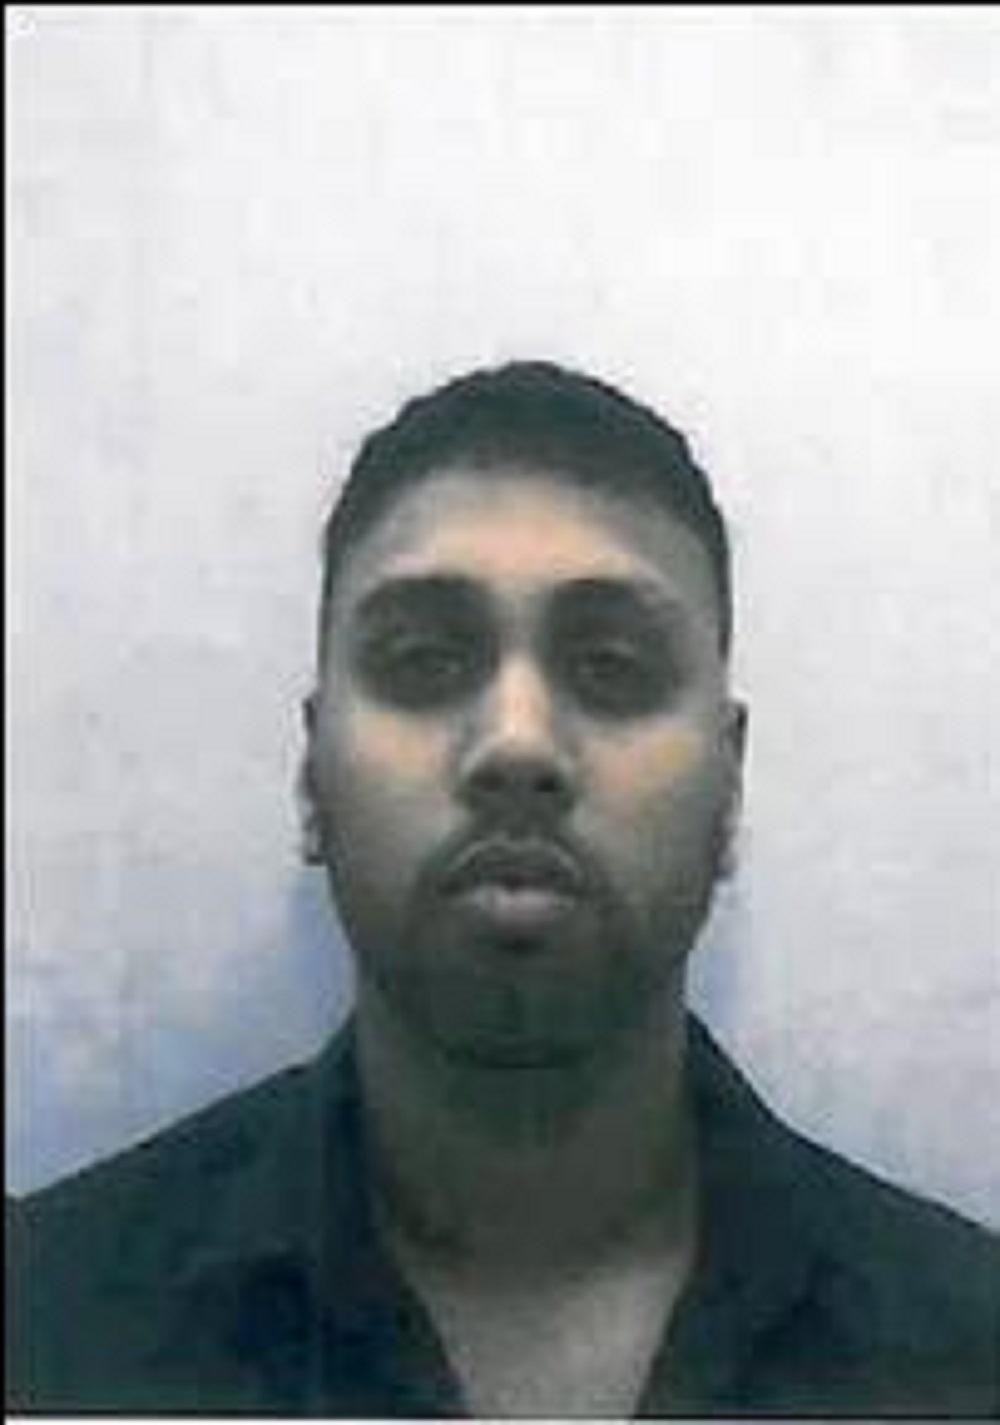 Bilal Hussain